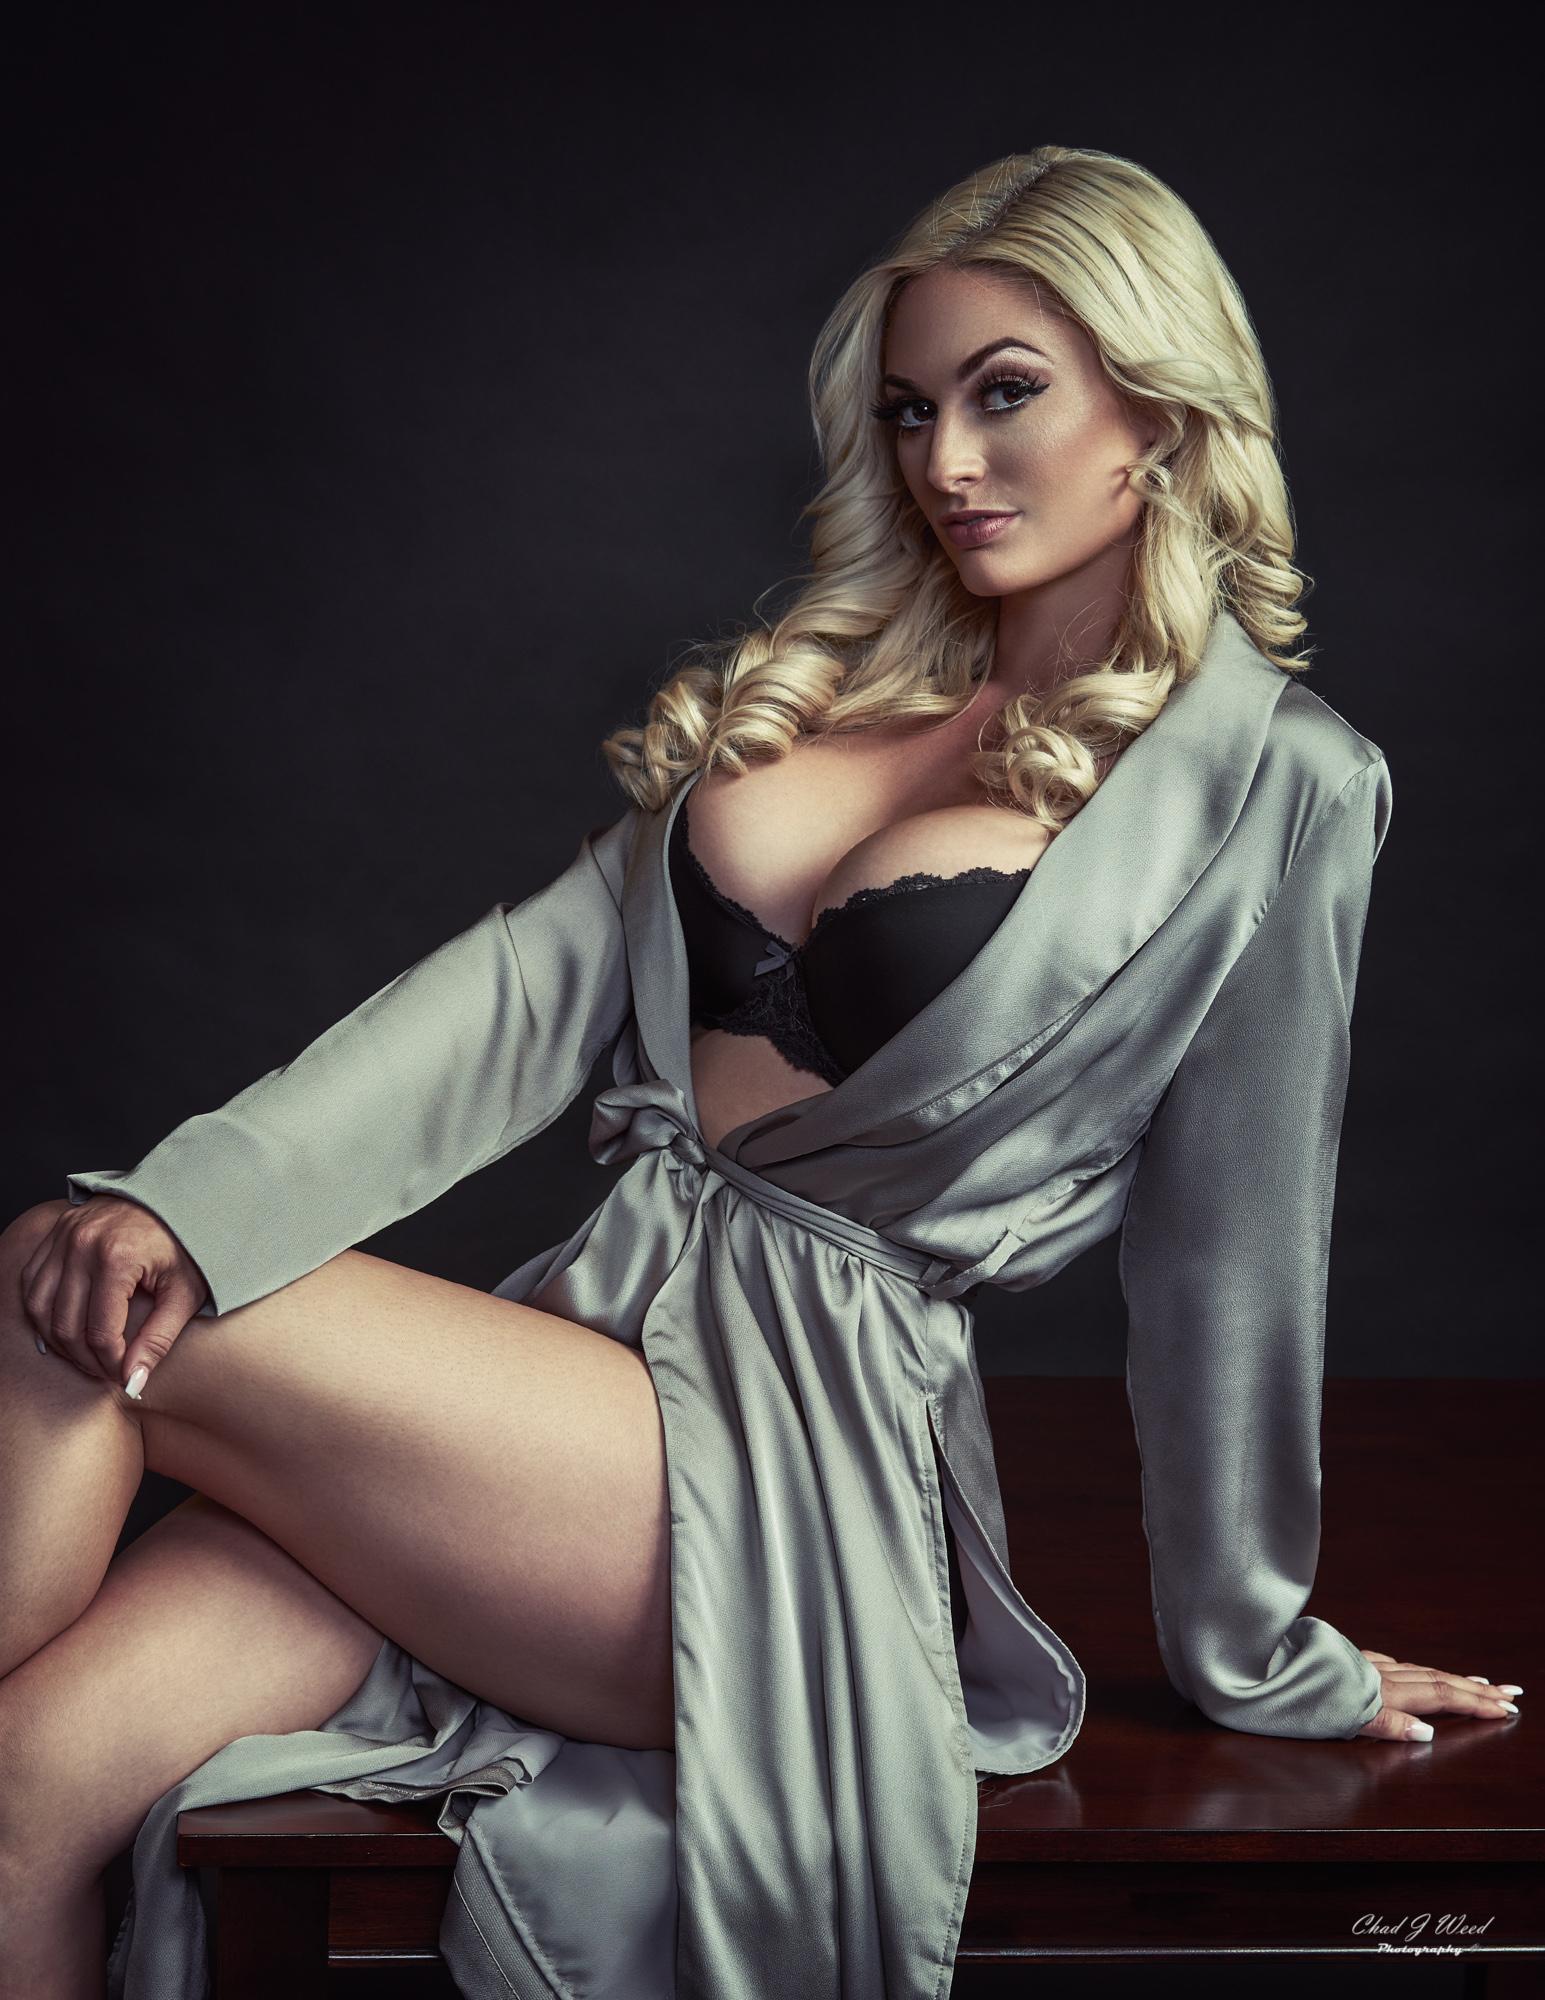 Beauty Model Cassie by Mesa Arizona Beauty Photographer Chad Weed